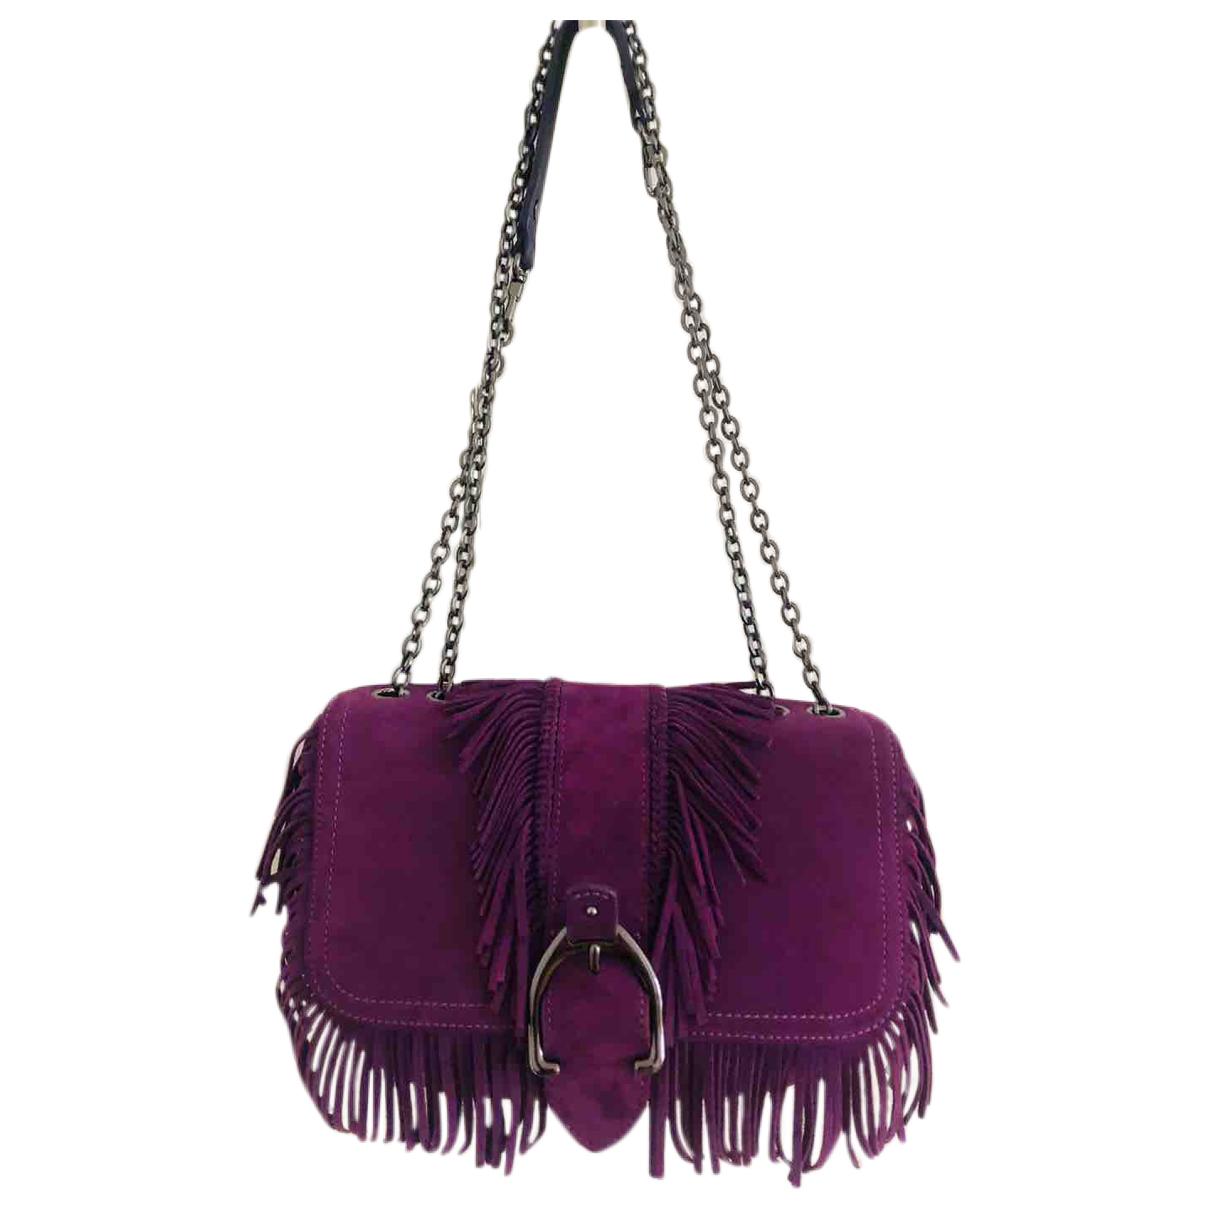 Longchamp \N Purple Leather Clutch bag for Women \N